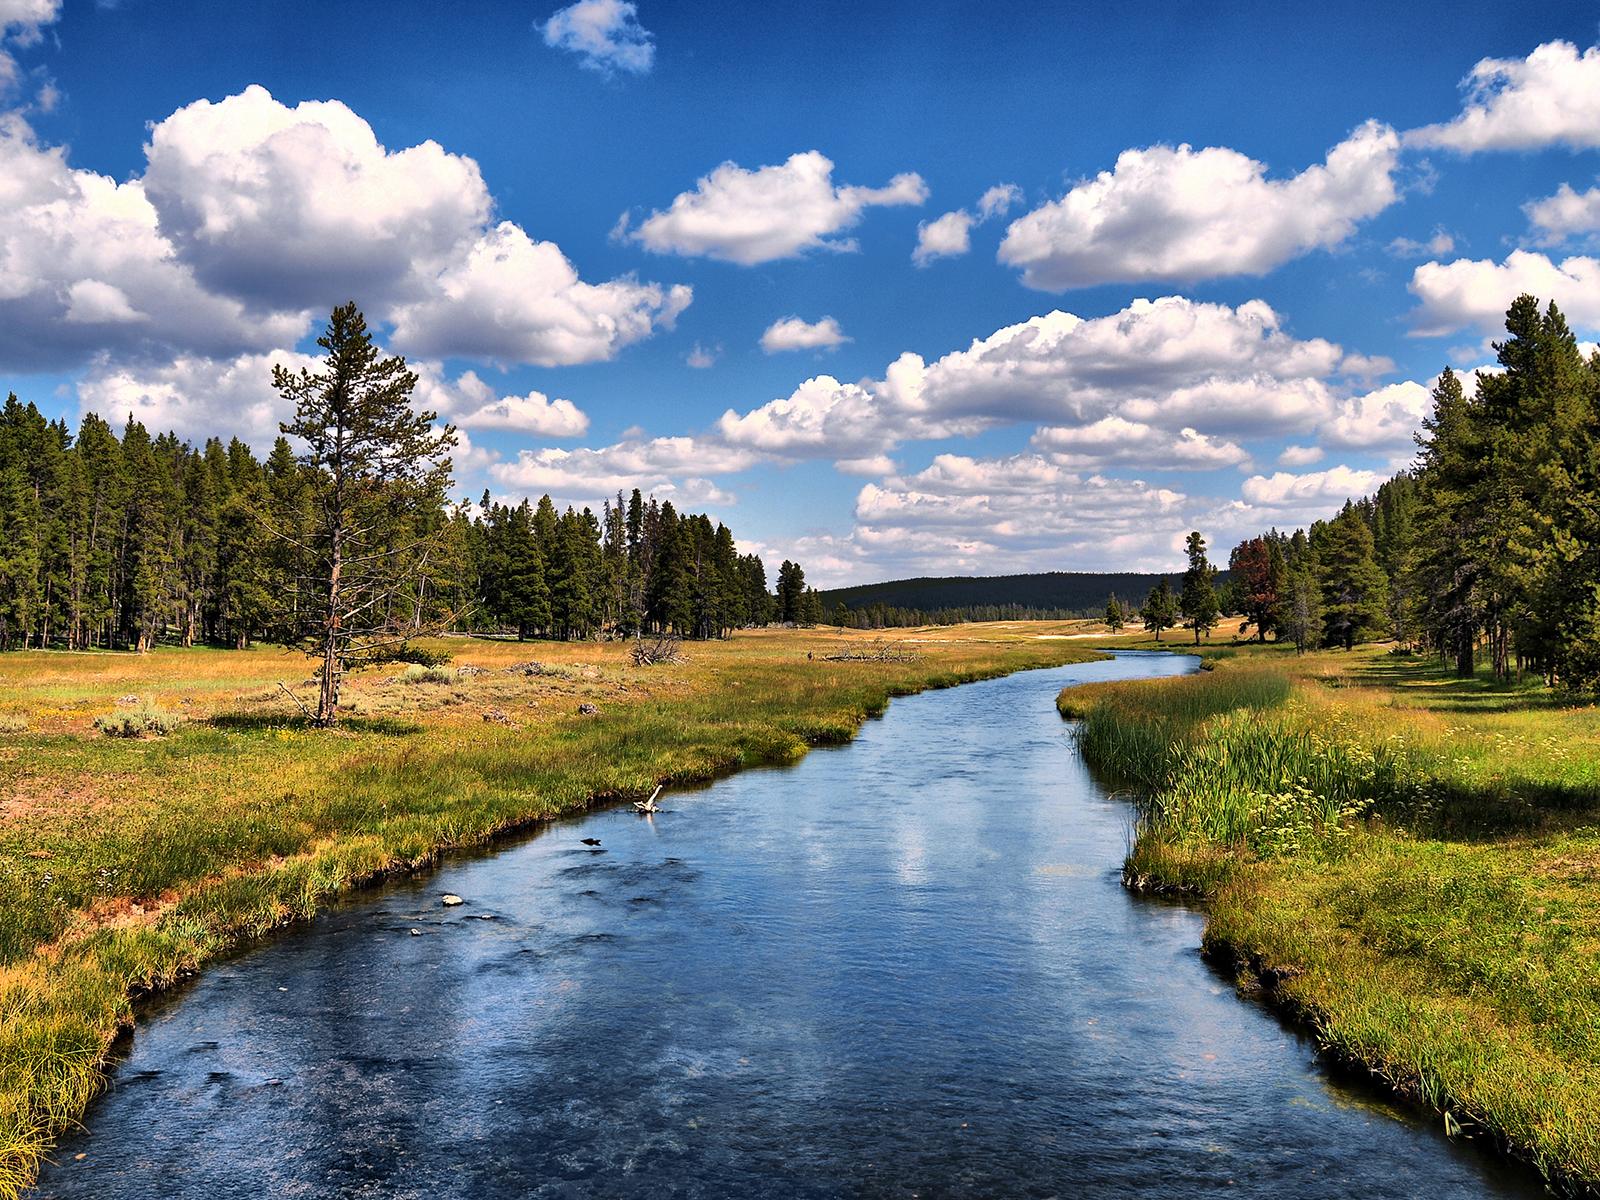 Yellowstone National Park Wallpaper   9379 1600x1200